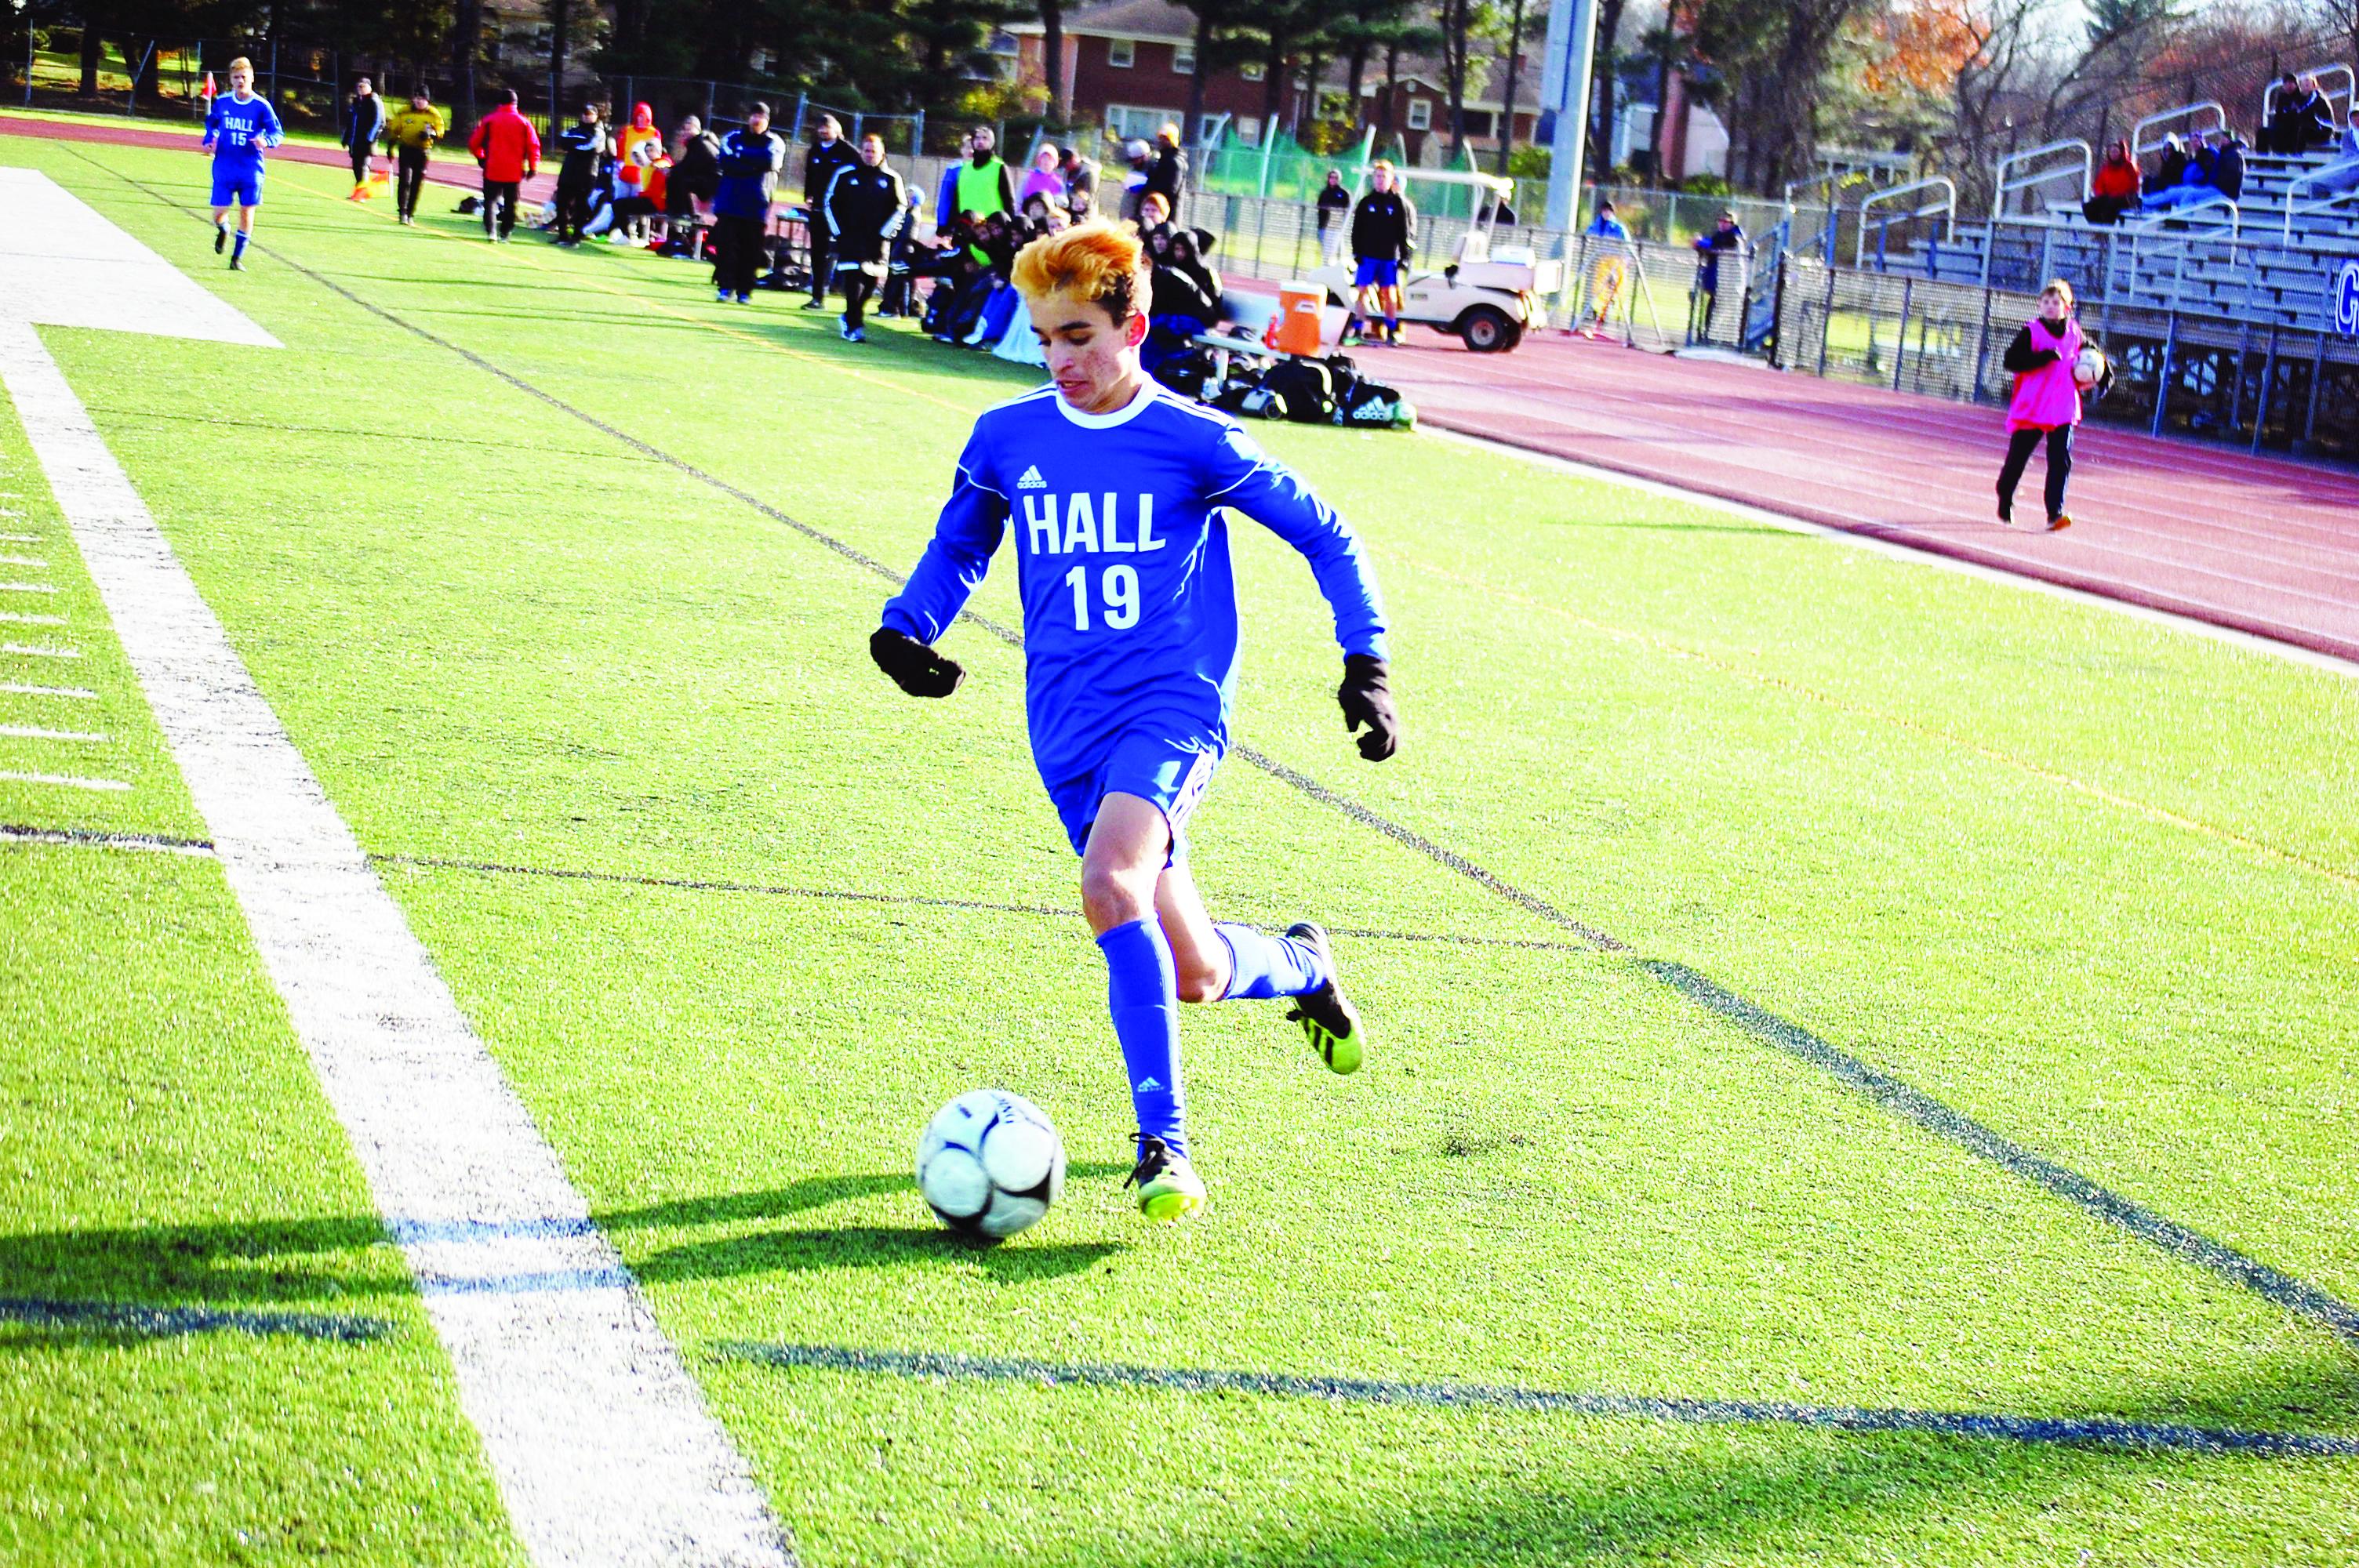 West Hartford High School Boys Soccer Preview - We-Ha | West Hartford News